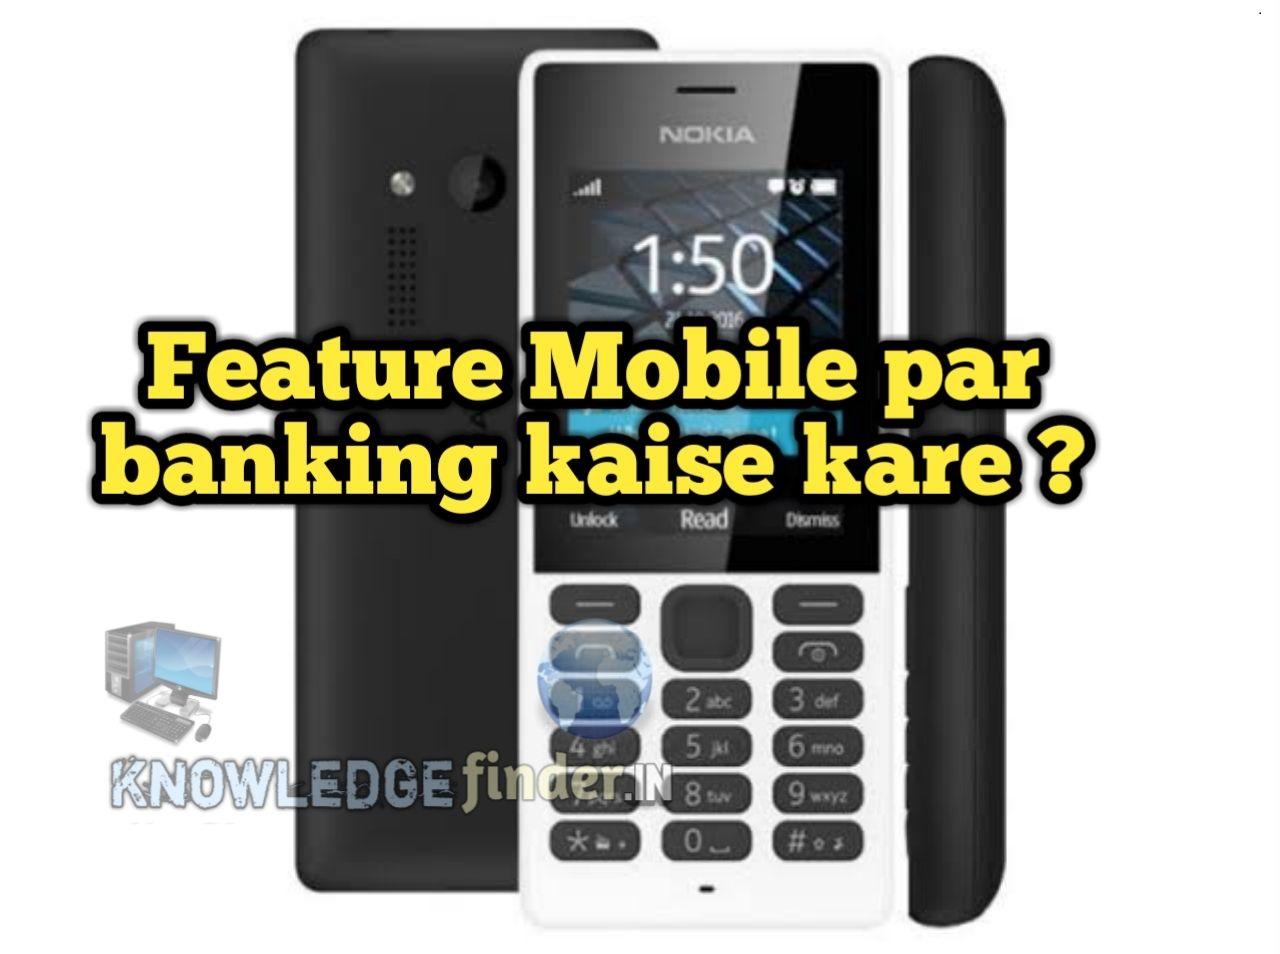 Feature Mobile par bhi banking kare